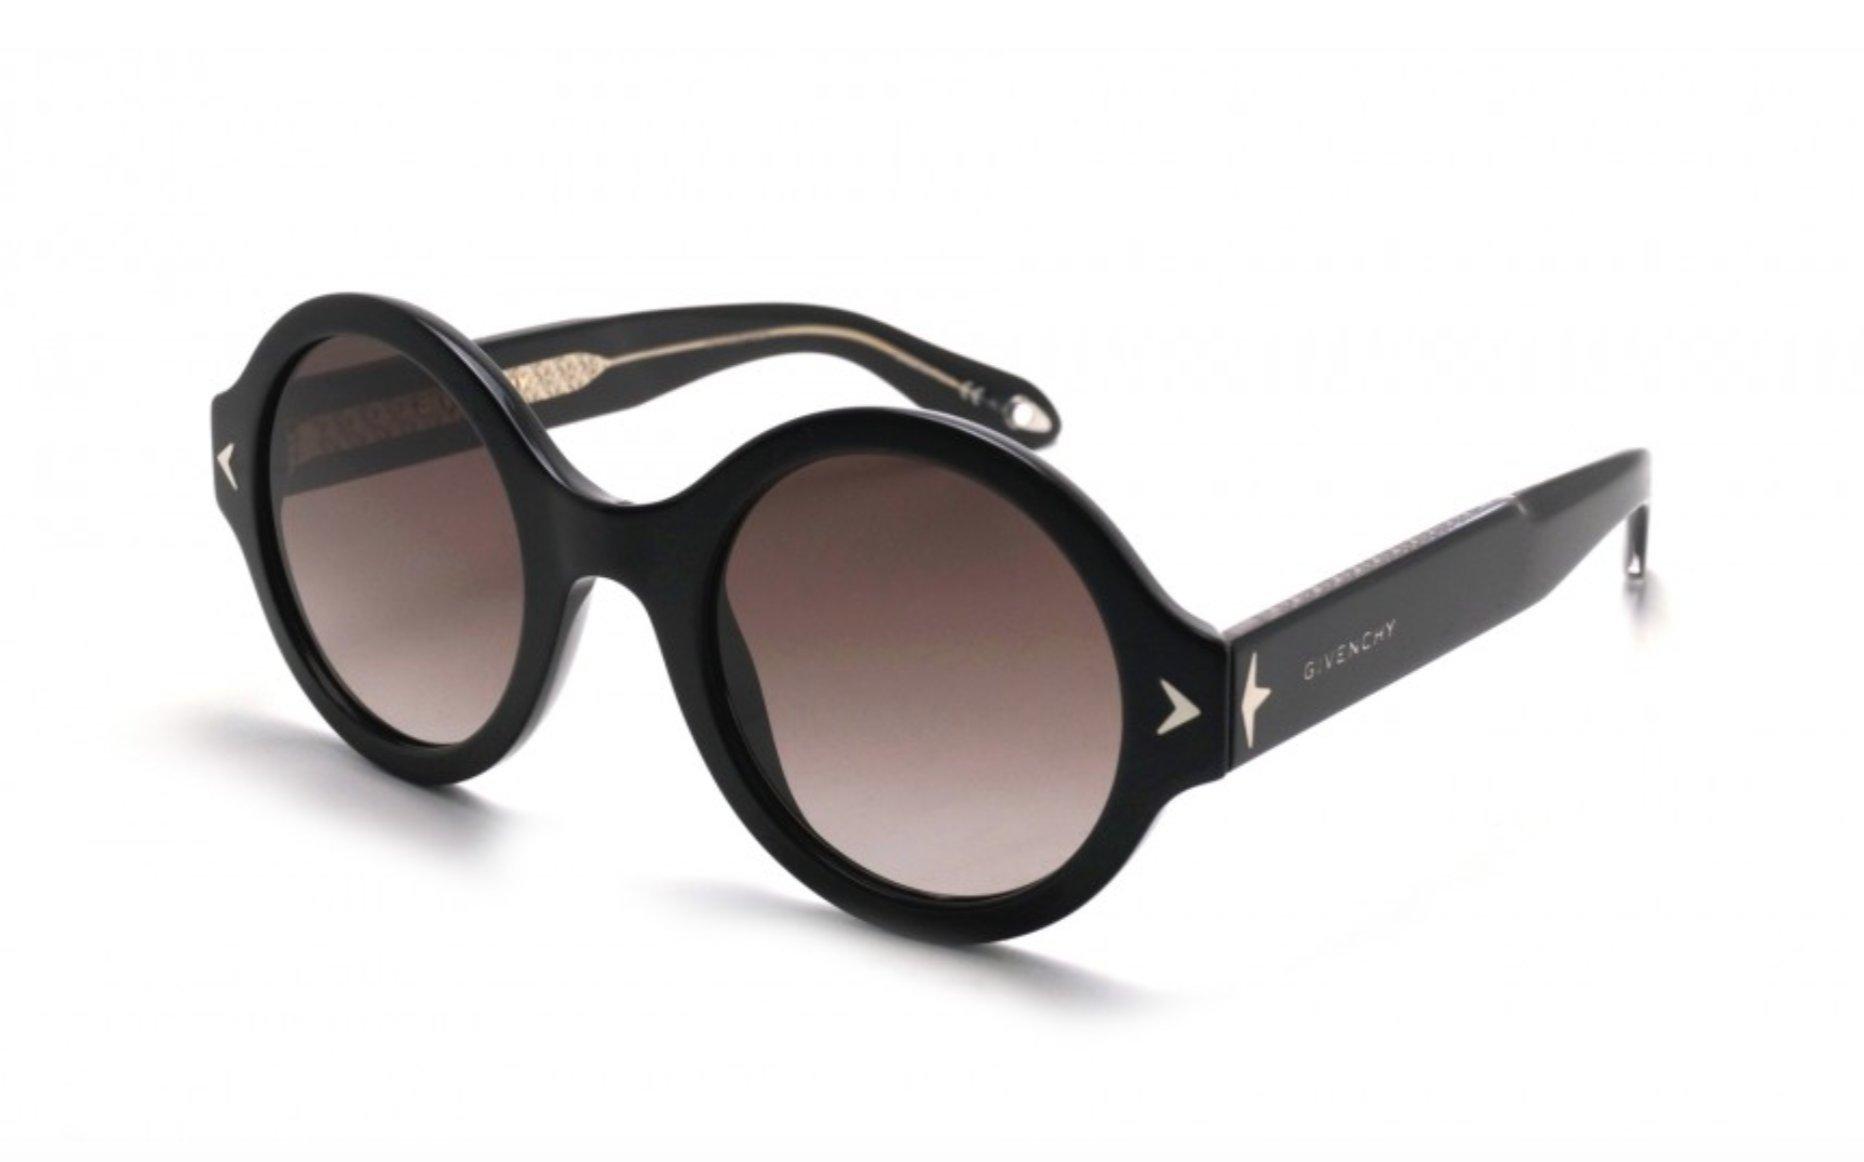 Givenchy GV 7036/S - Y6CHA Sunglasses